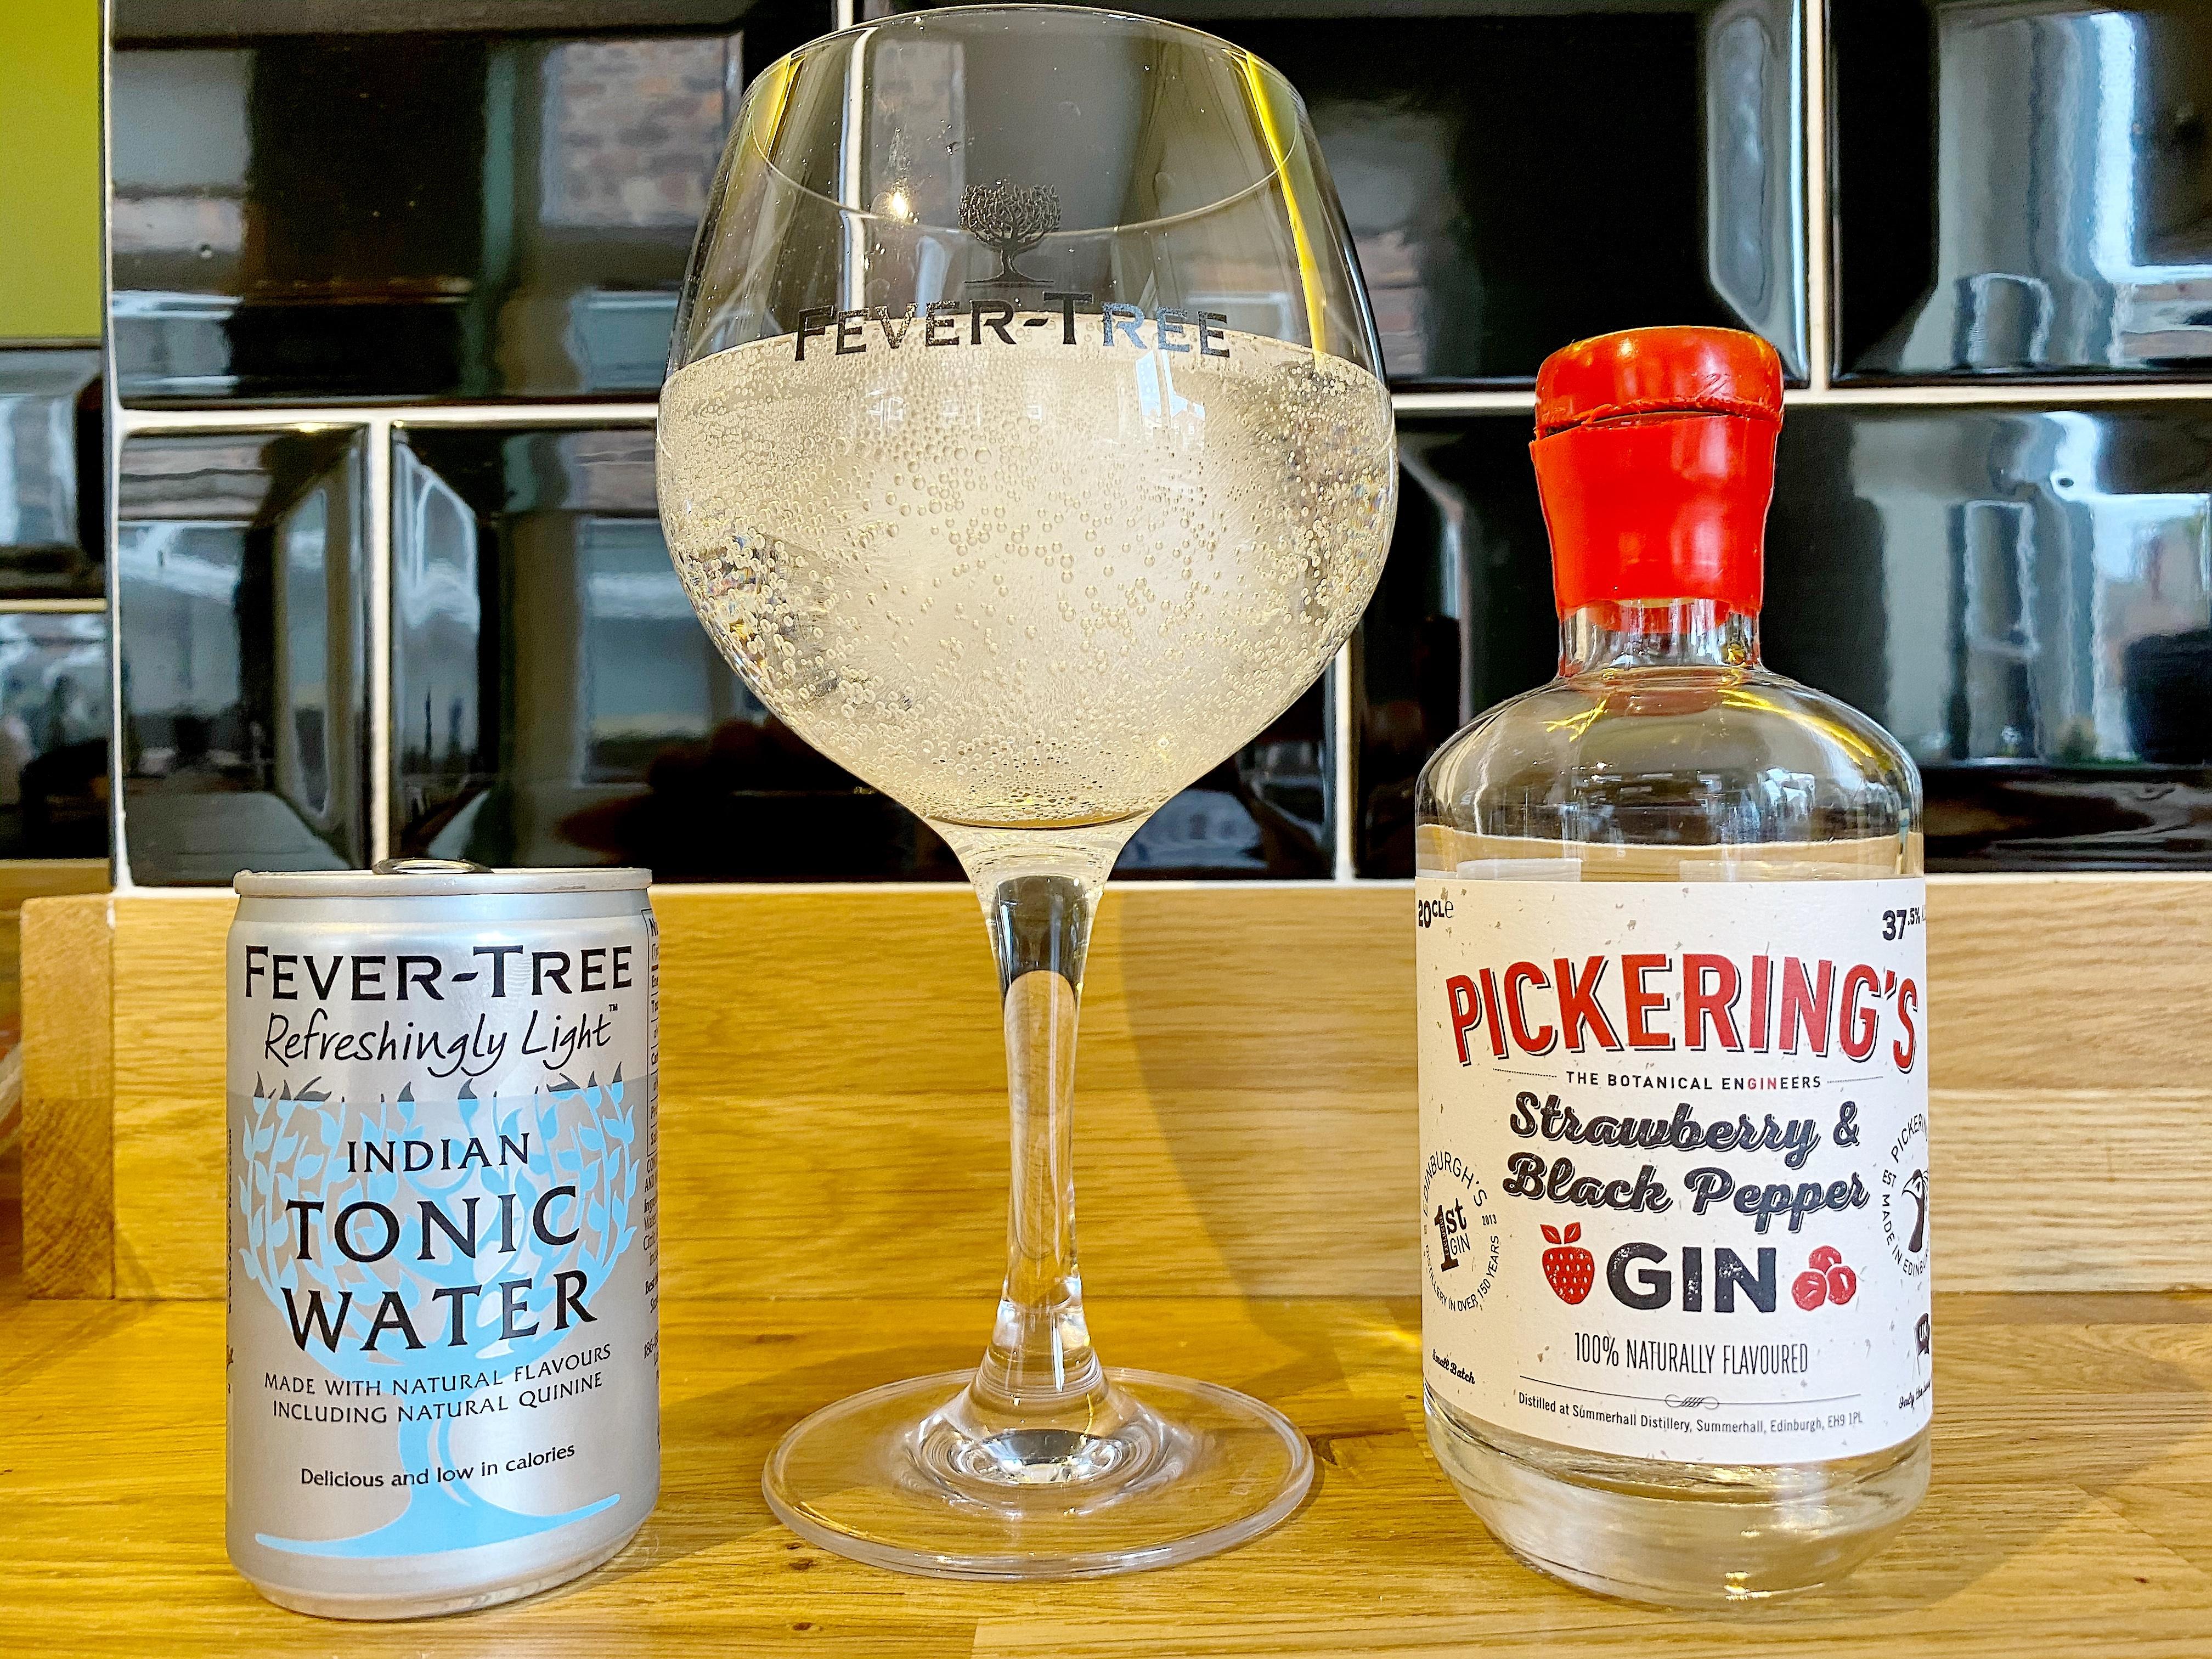 Pickerings Gin – Celebrating Scottish Gin with International Scottish Gin Day 2020